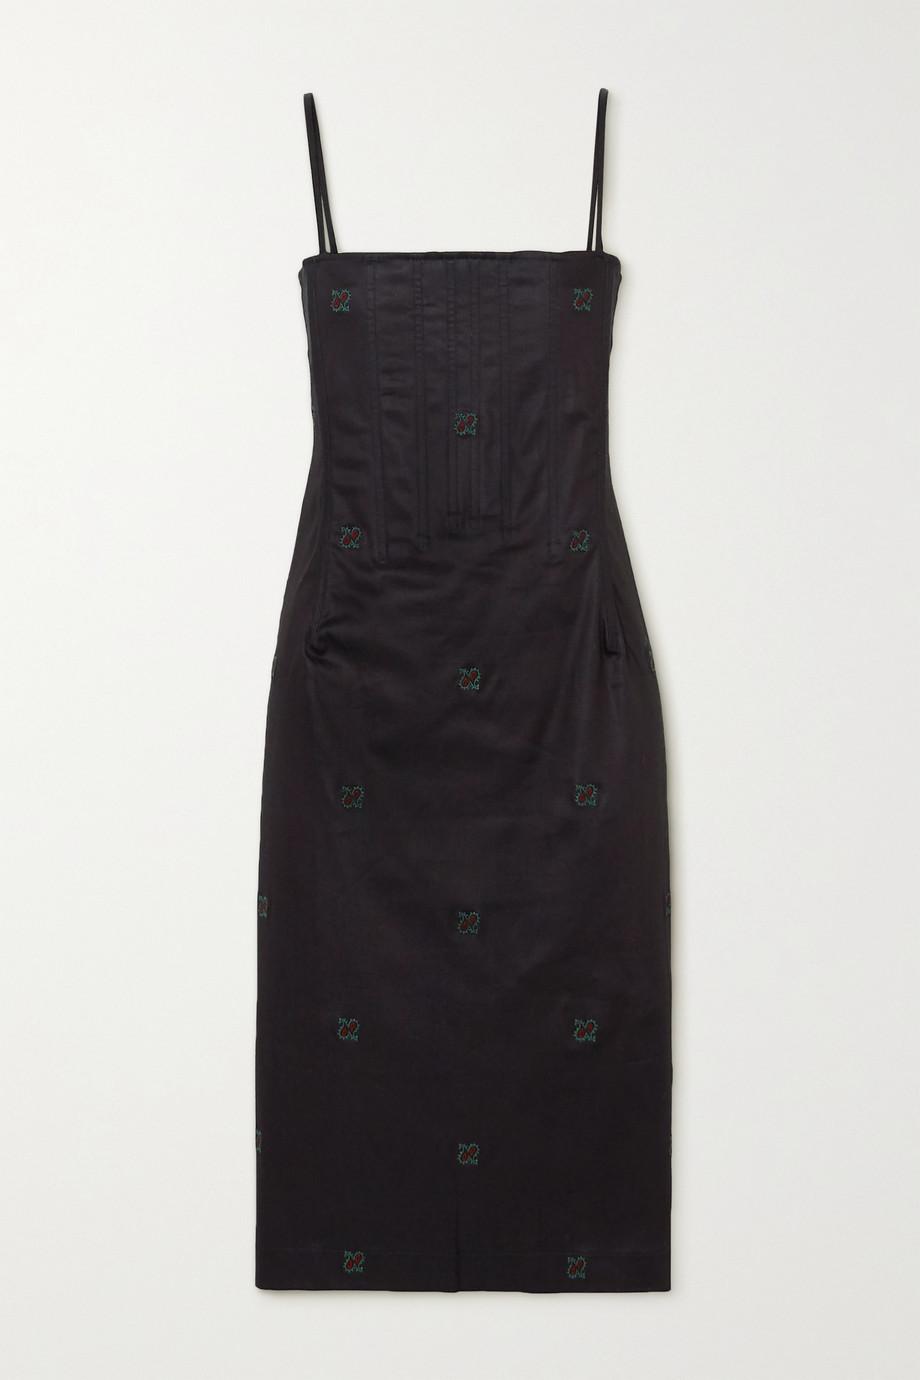 Miaou Degas embroidered stretch-cotton chambray dress